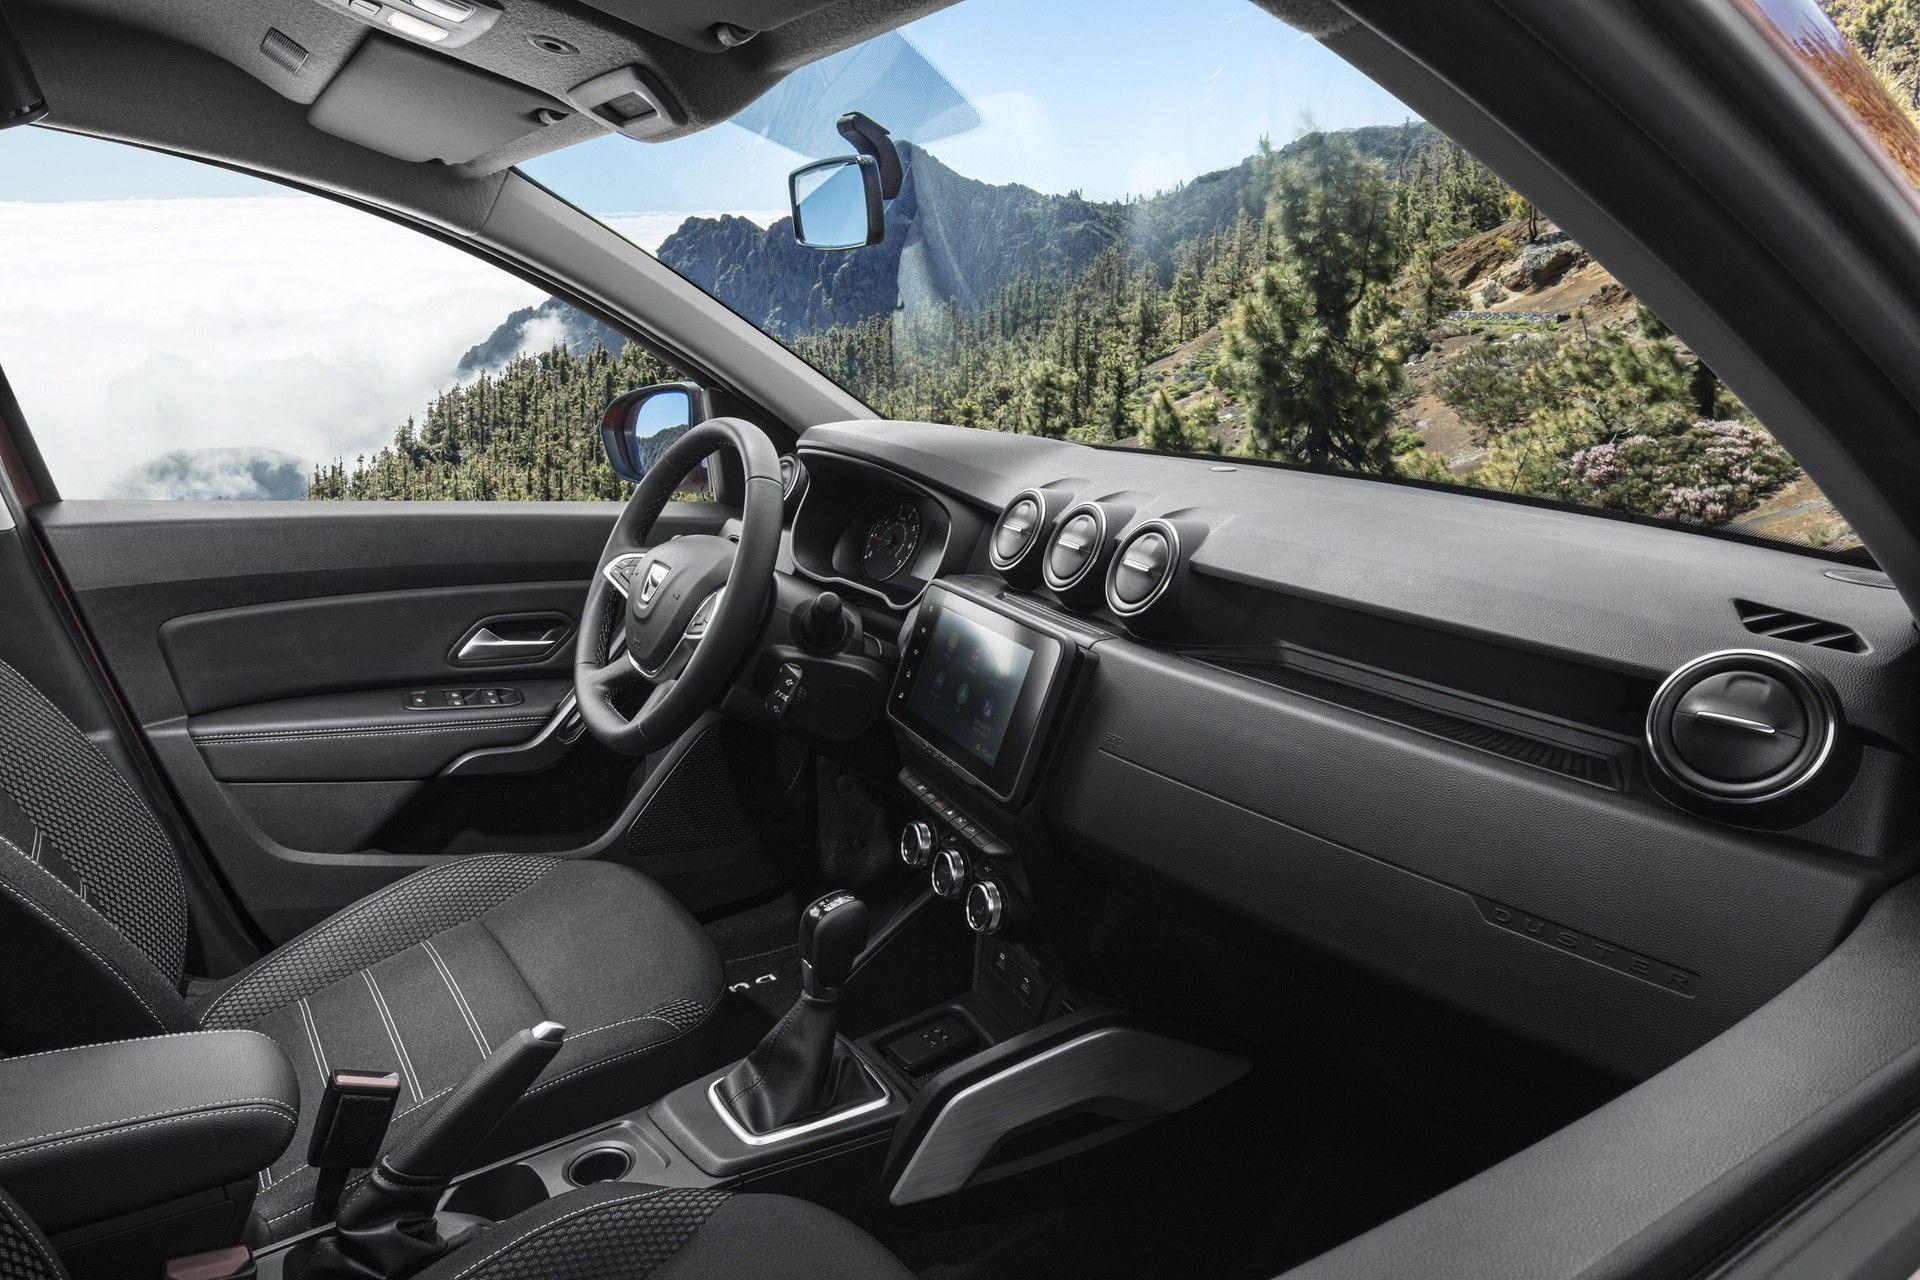 2021_Dacia_Duster_facelift-0001